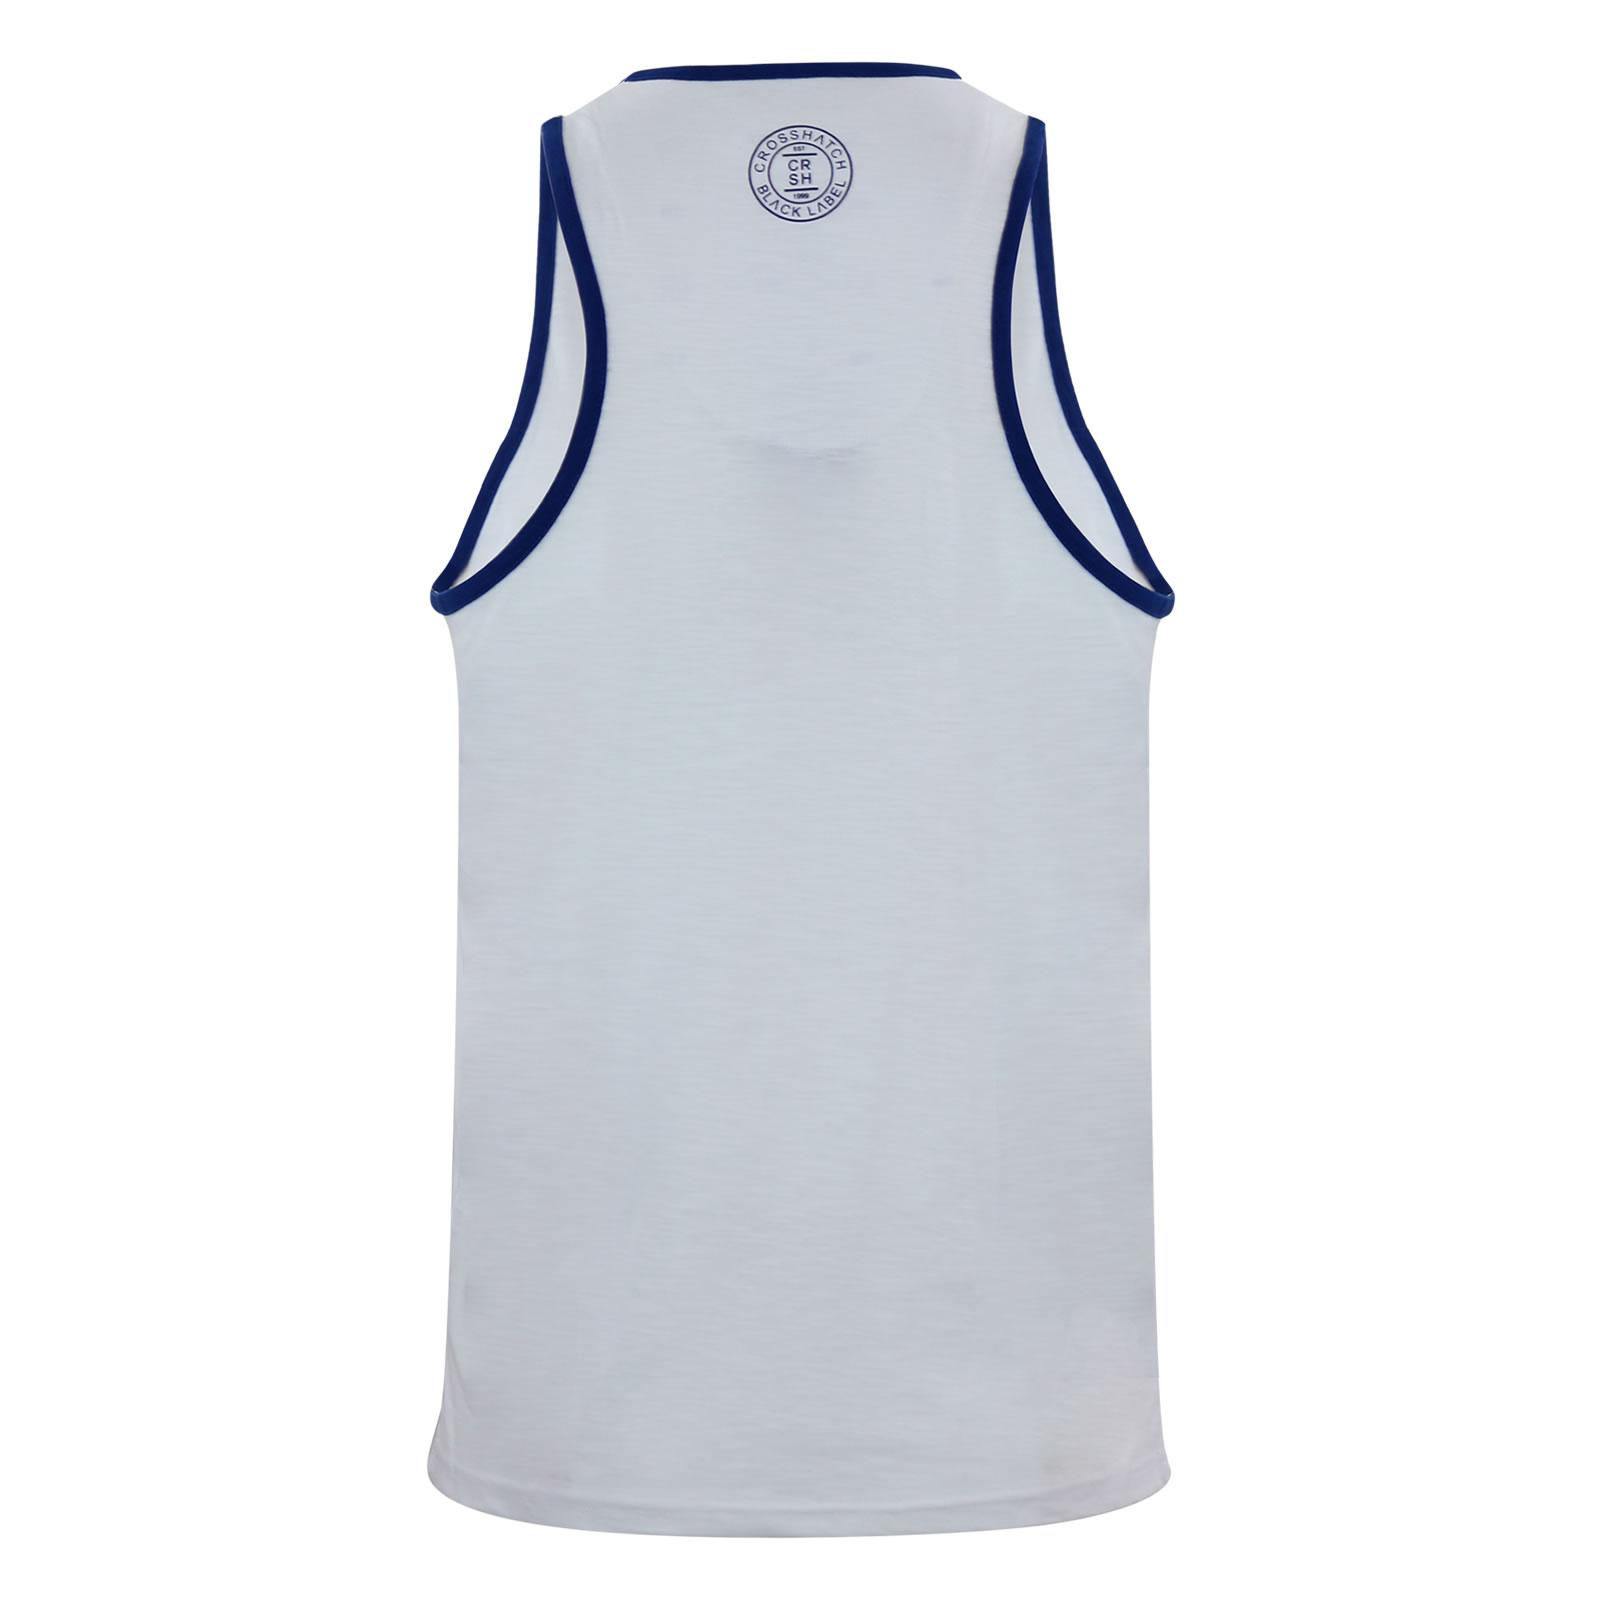 miniature 15 - Homme-debardeur-t-shirt-crosshatch-alfa-summer-muscle-back-tank-top